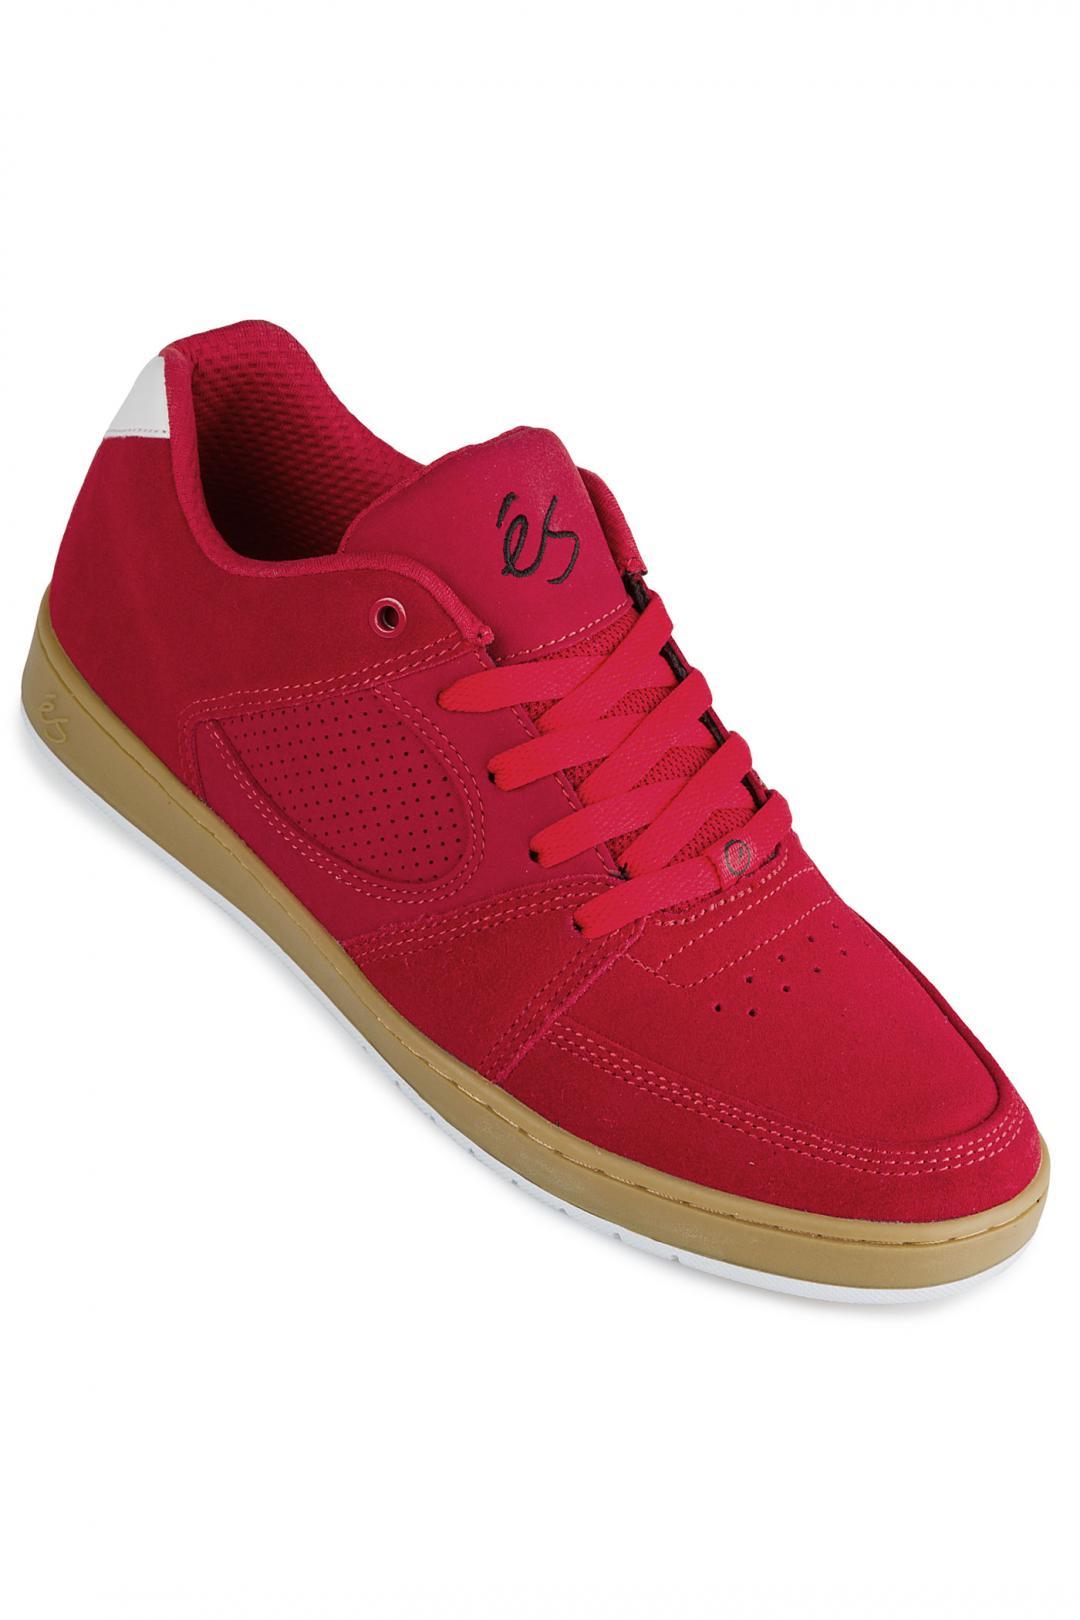 Uomo éS Accel Slim red gum | Sneakers low top